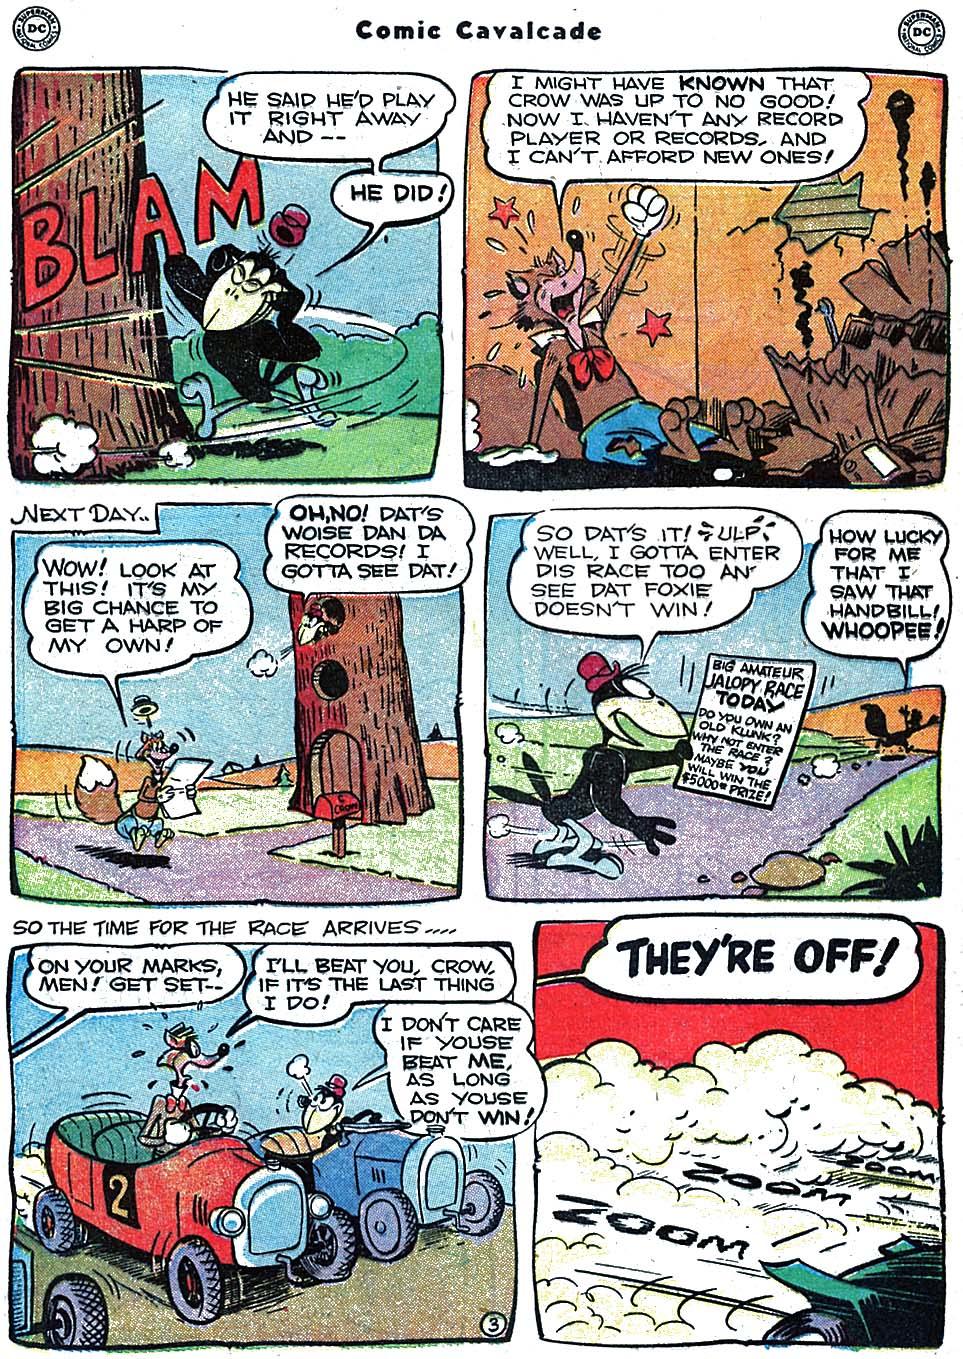 Comic Cavalcade issue 38 - Page 5